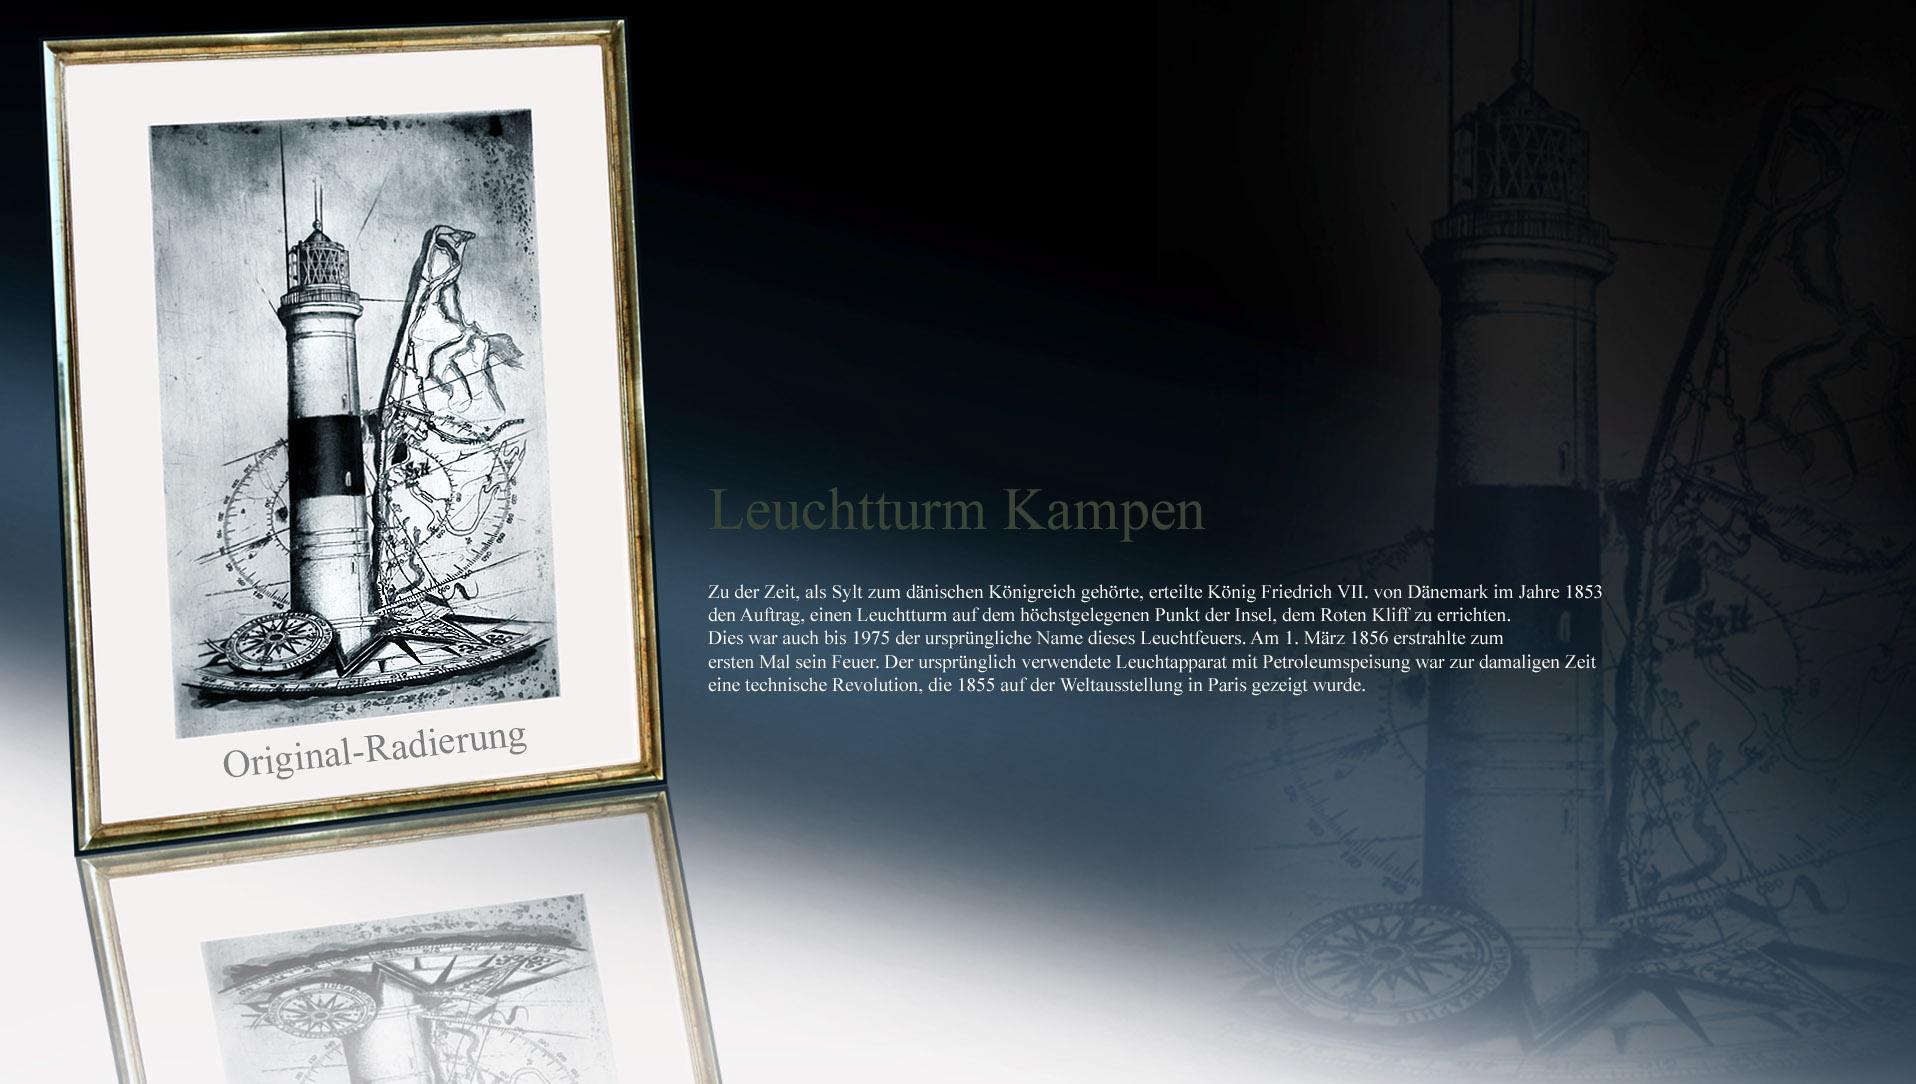 radierung_leuchtturm_kampen_sylt